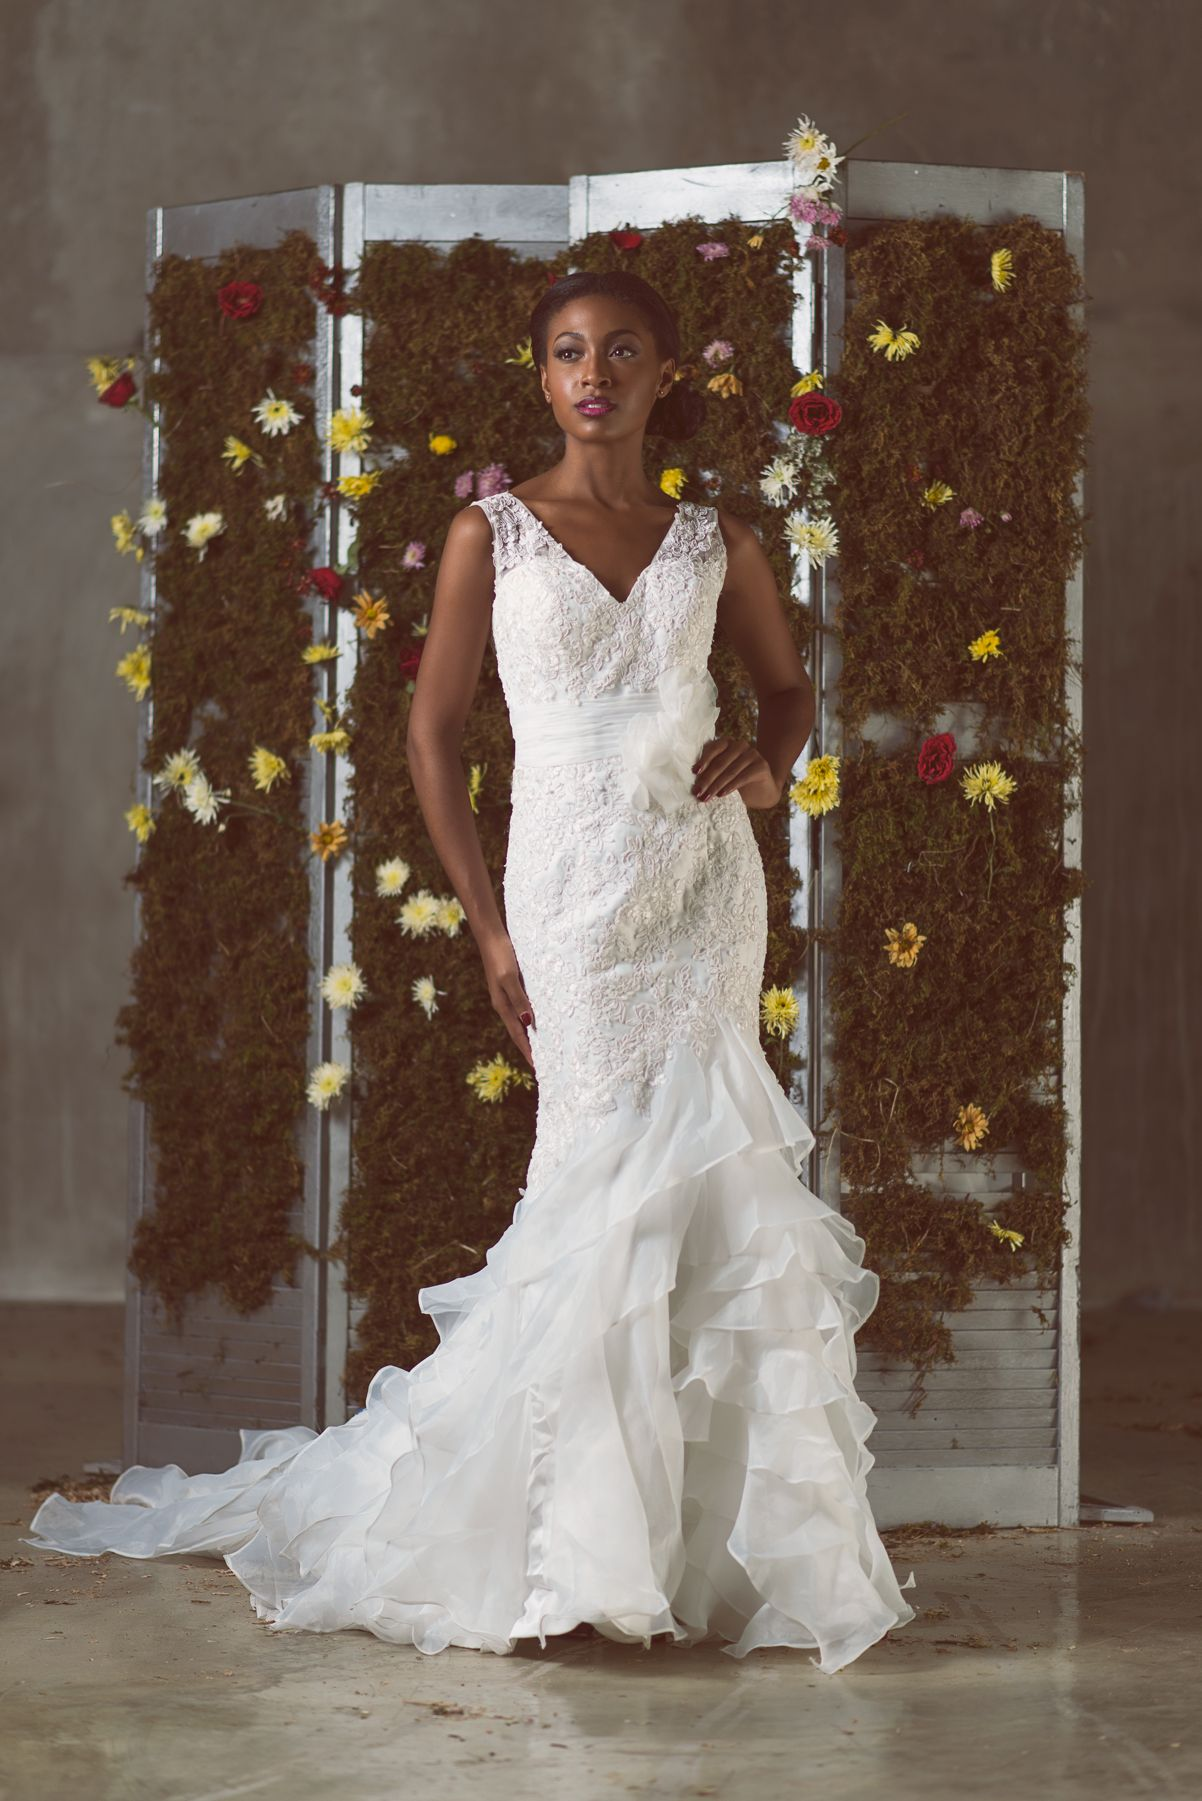 Black Wedding Dress Designers to Wear on the Big Day